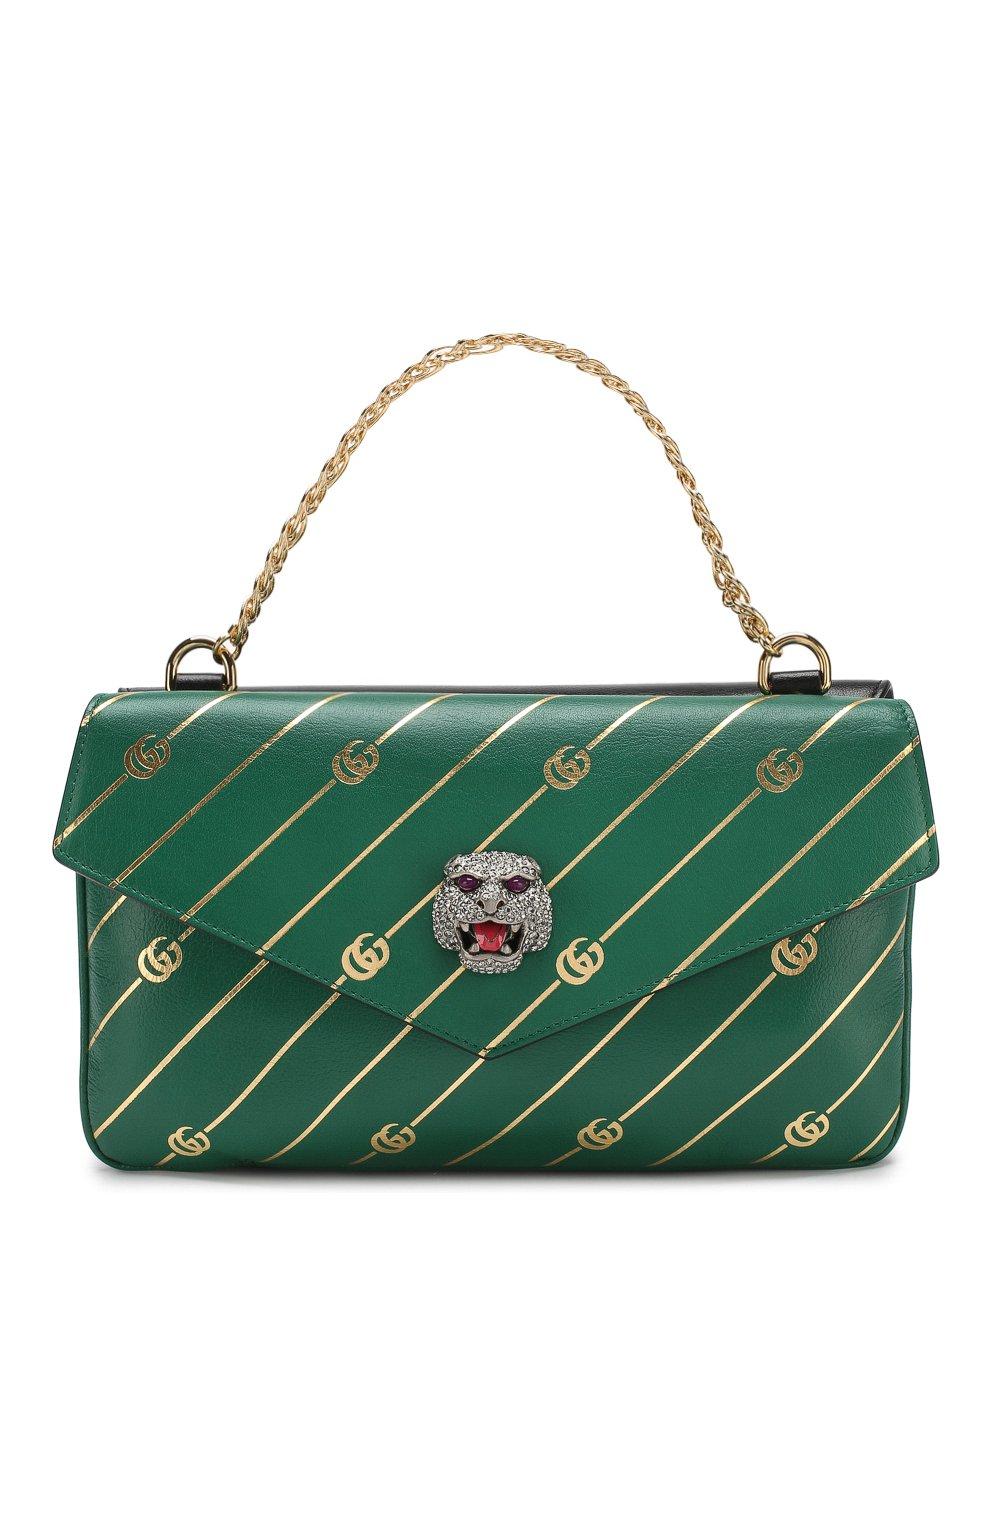 c5dacf396042 Сумки Gucci по цене от 56 000 руб. купить в интернет-магазине ЦУМ